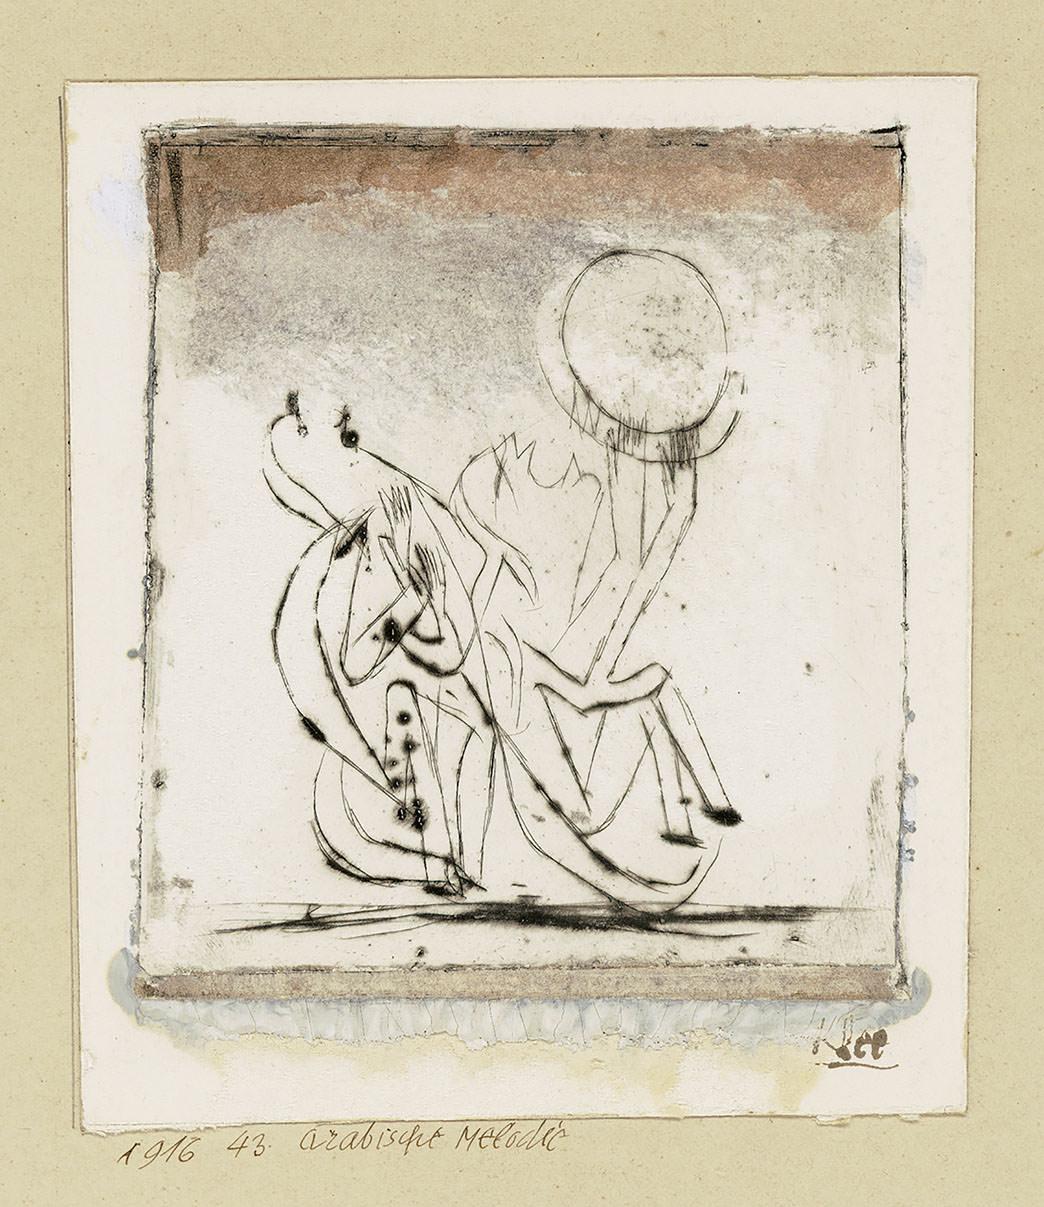 Abb.44 Paul Klee, Arabische Melodie, 1916, 43 , Kaltnadel, koloriert 13,7 x 12 cm , Museum Sammlung Rosengart, Luzern © Zentrum Paul Klee, Bern, Archiv